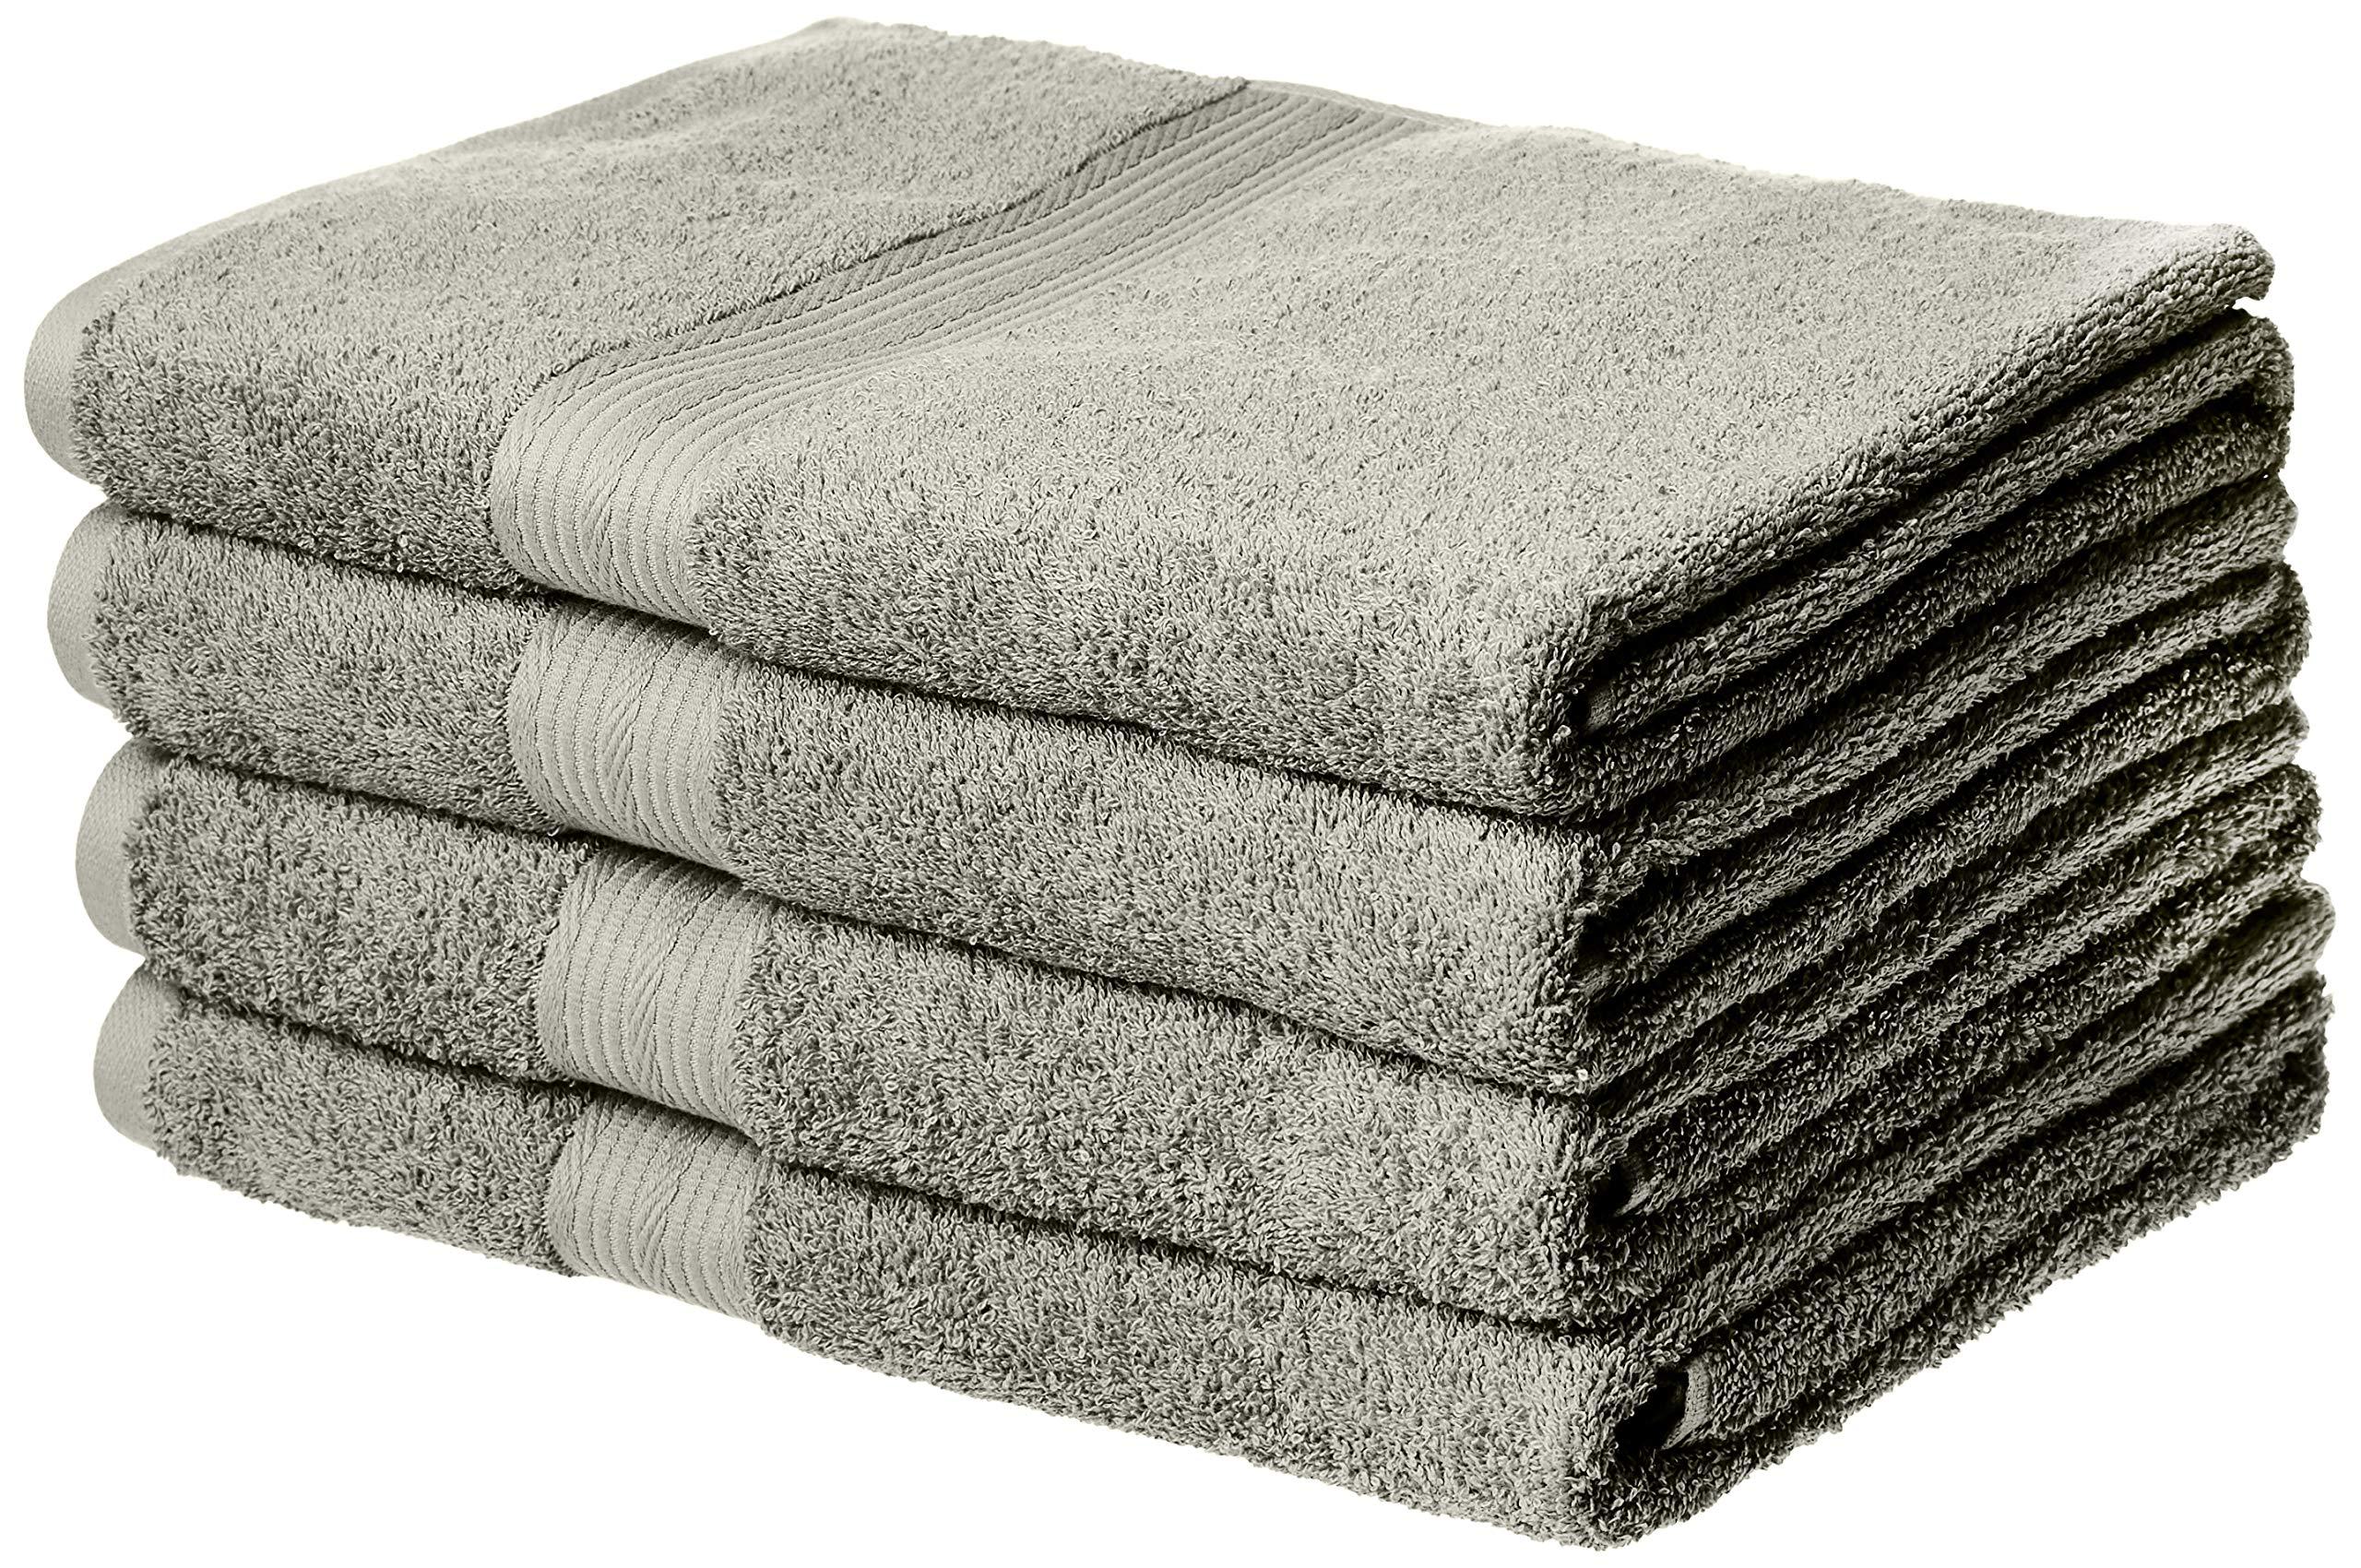 AmazonBasics Fade-Resistant Cotton Bath Towel - Pack of 4, Grey by AmazonBasics